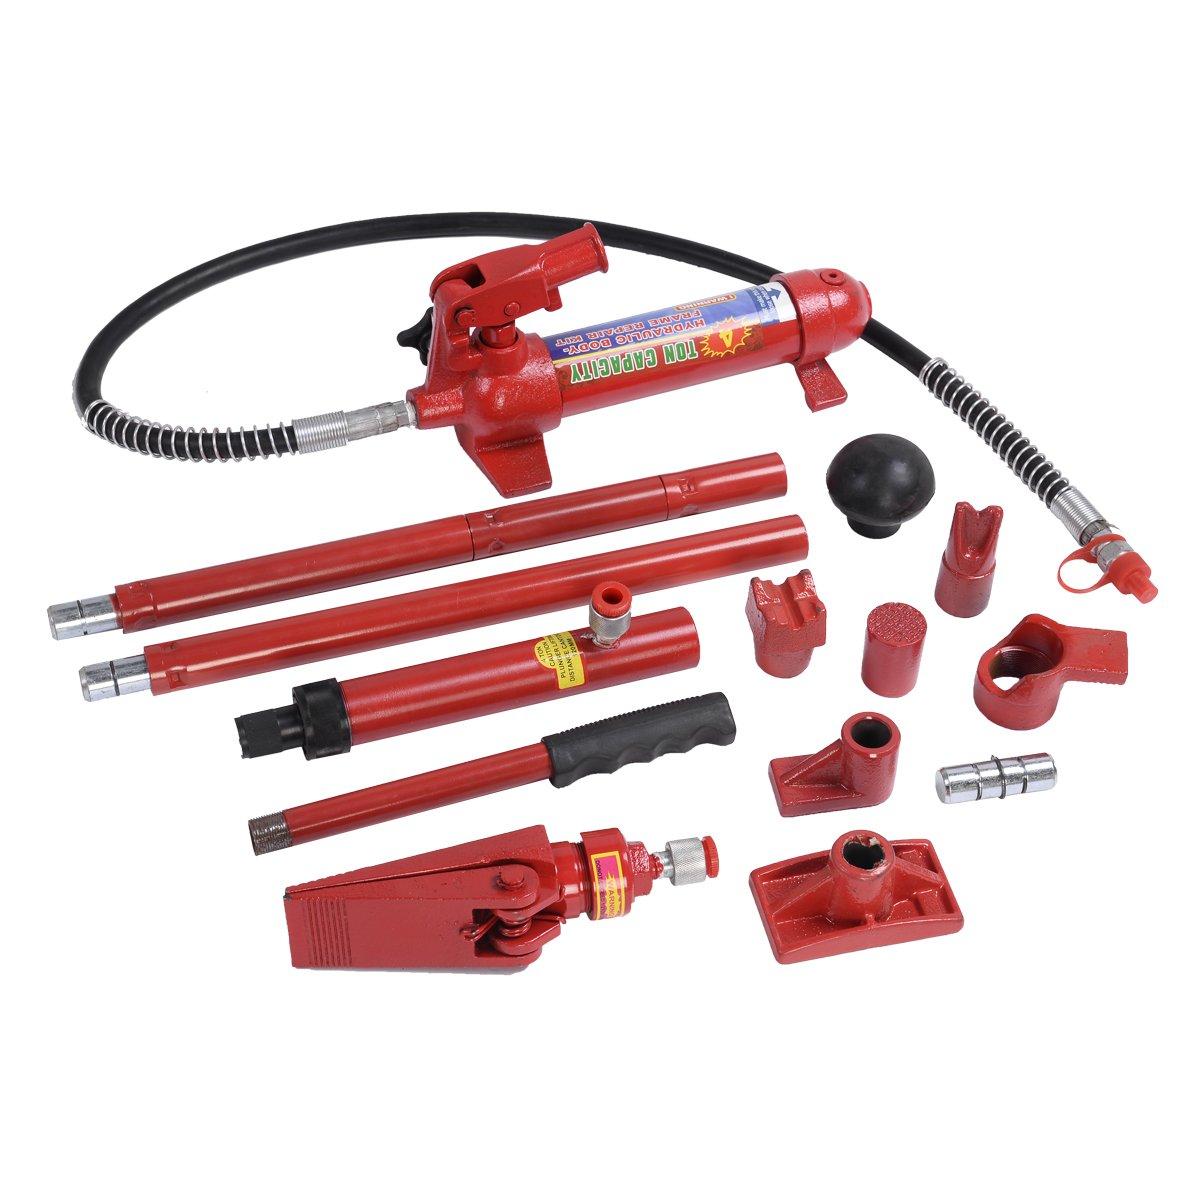 Goplus 4 Ton Porta Power Hydraulic Jack Body Frame Repair Kit Auto Shop Tool Heavy Set w/ Carrying Case by Goplus (Image #5)